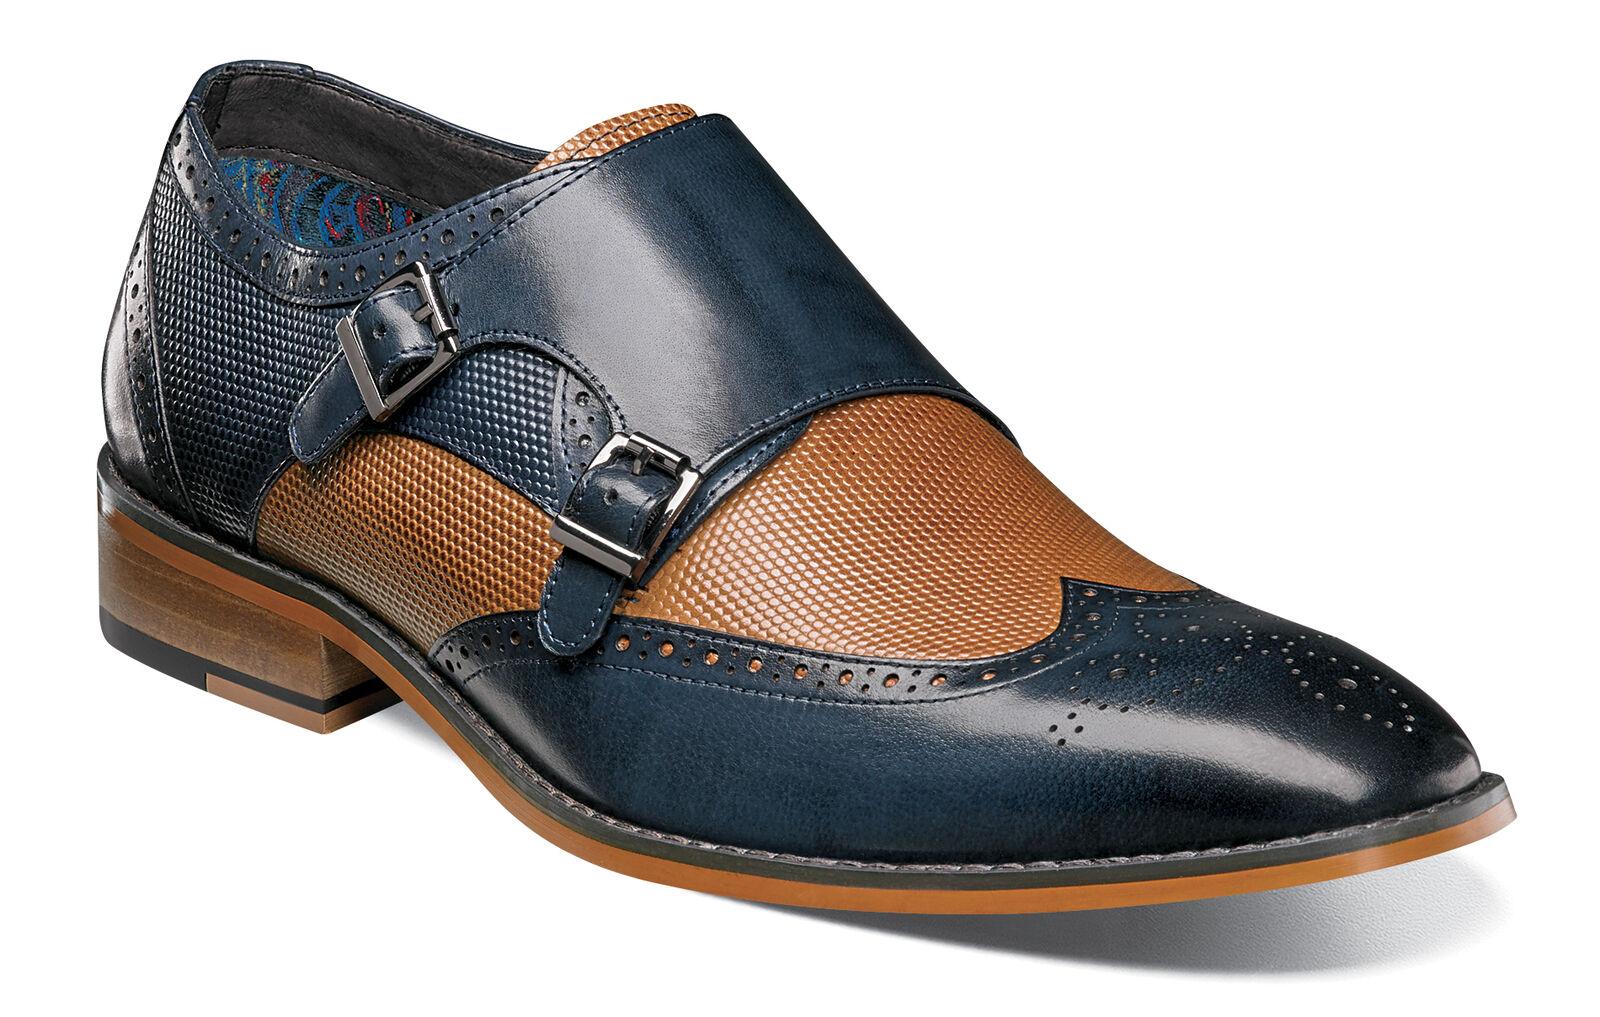 Stacy Adams Lavine Navy Blue/Cognac Double Monk Strap Buckle Shoes Size 9.5 Scarpe classiche da uomo